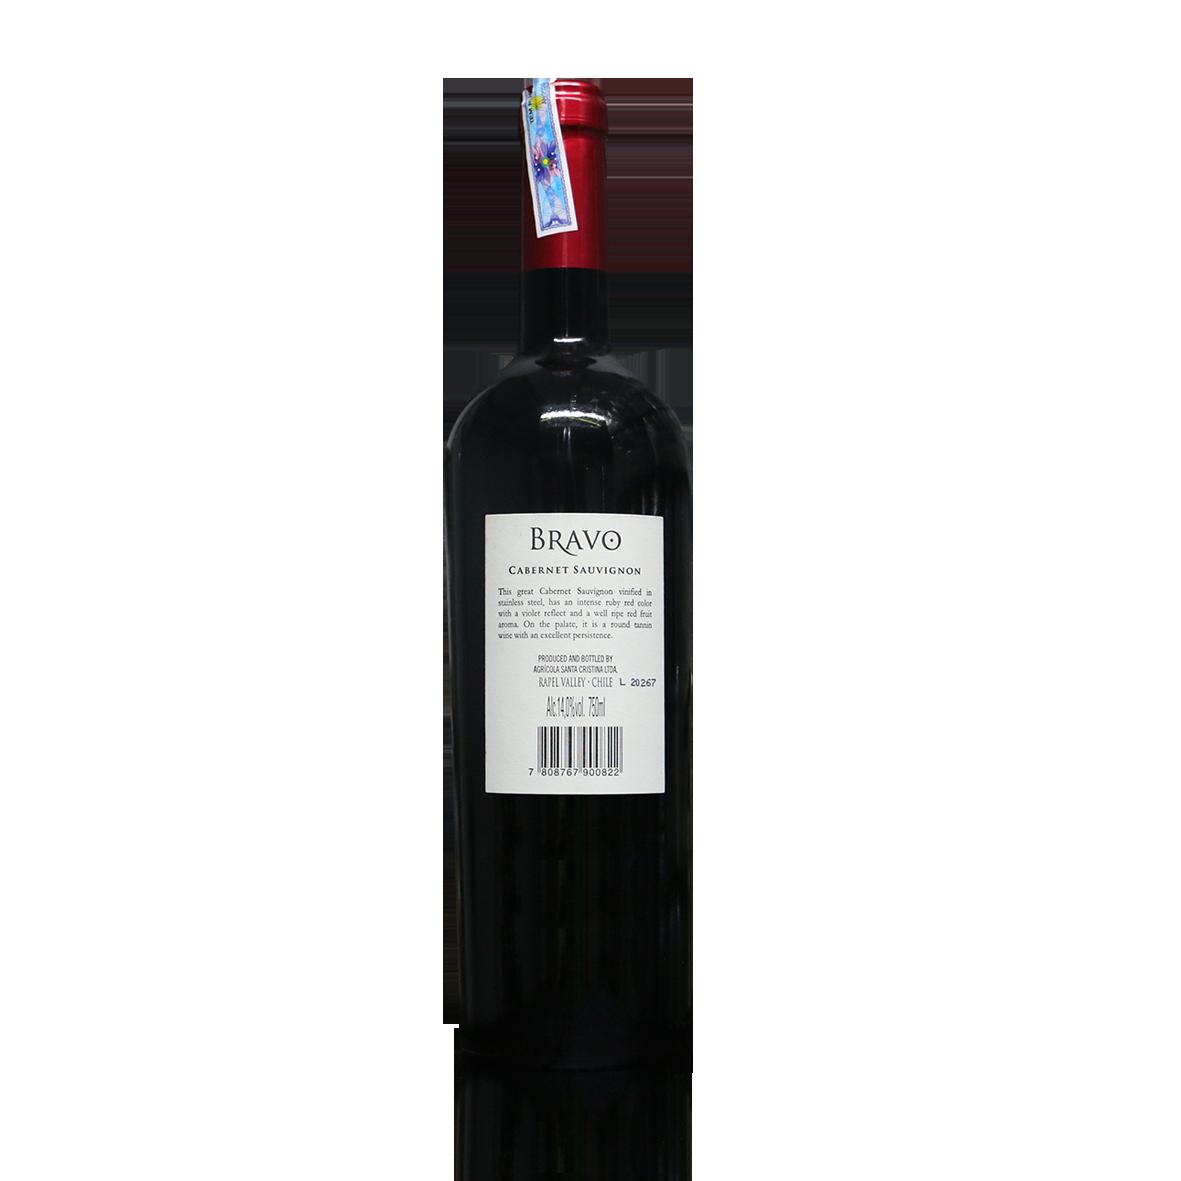 16 Bravo Cabernet sauvignon (Mat sau)